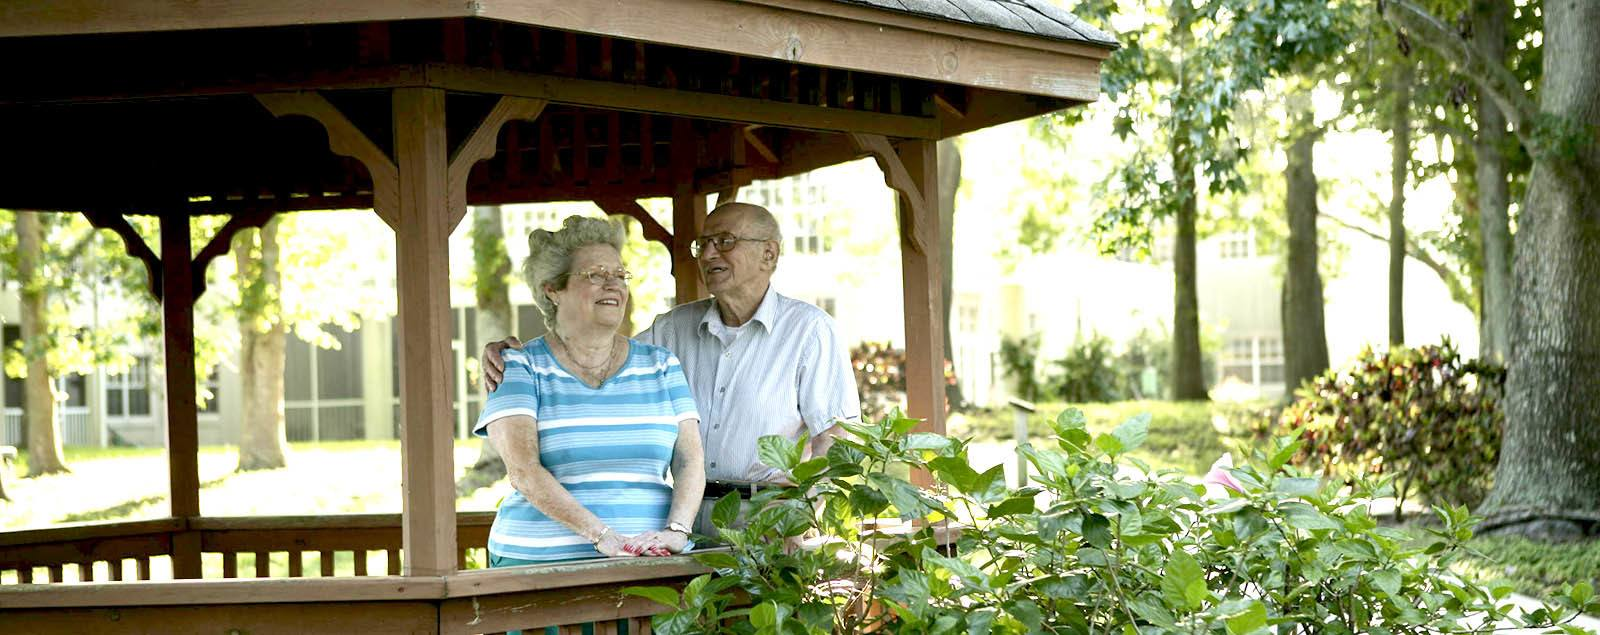 Request a Palm Harbor senior living facility brochure